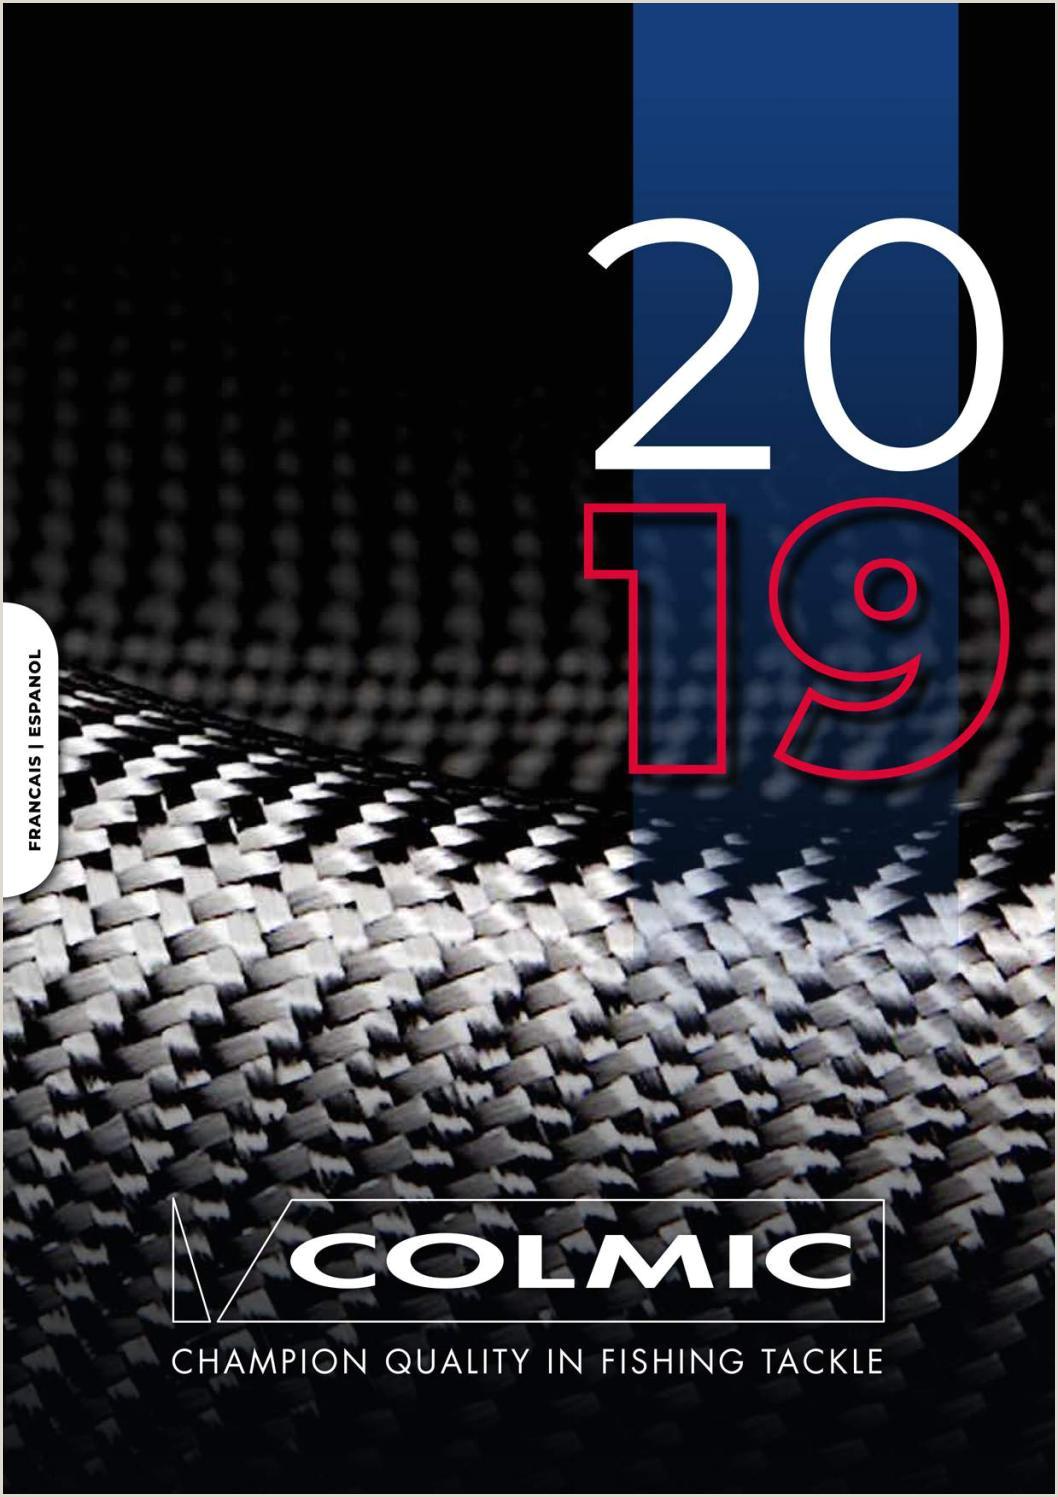 COLMIC2019 FRASPA by Colmic issuu